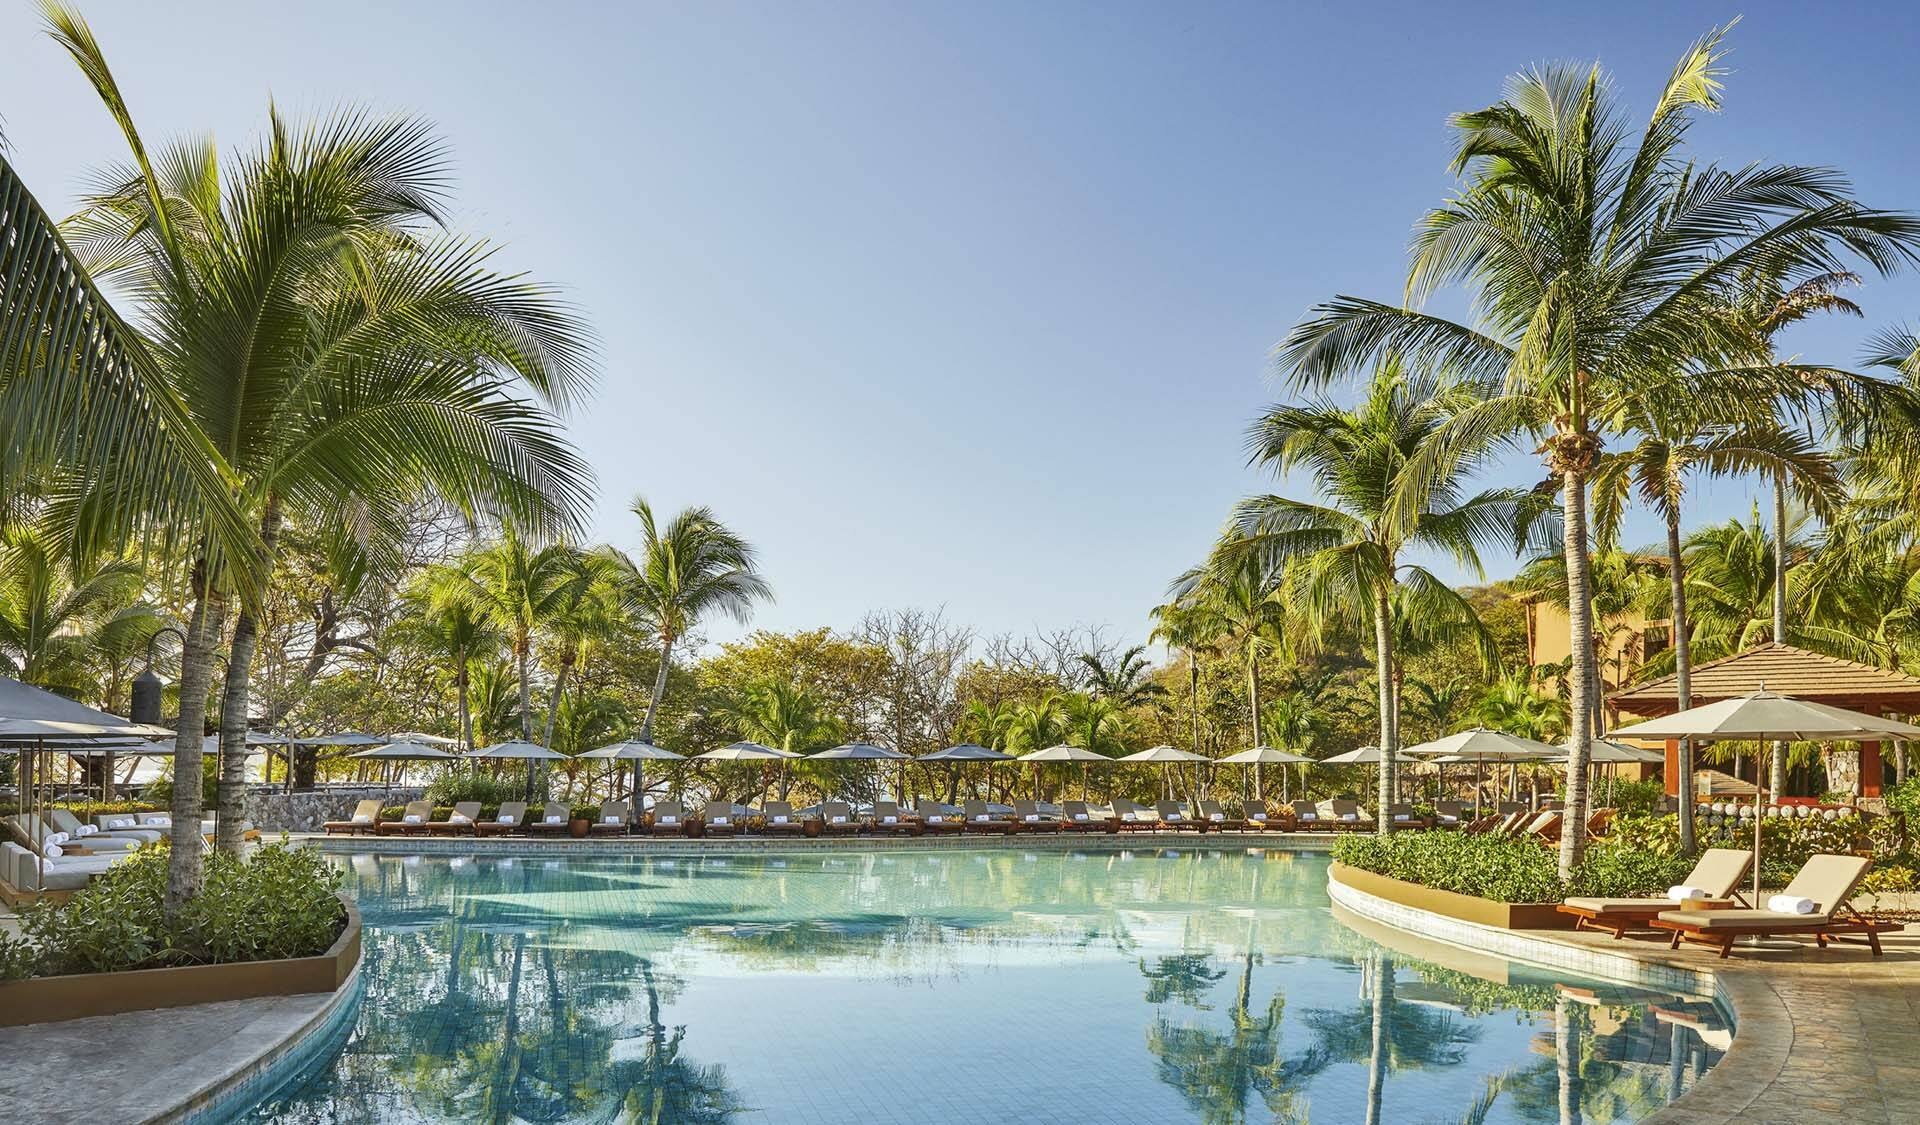 Costa Rica Four Seasons Papagayo pool